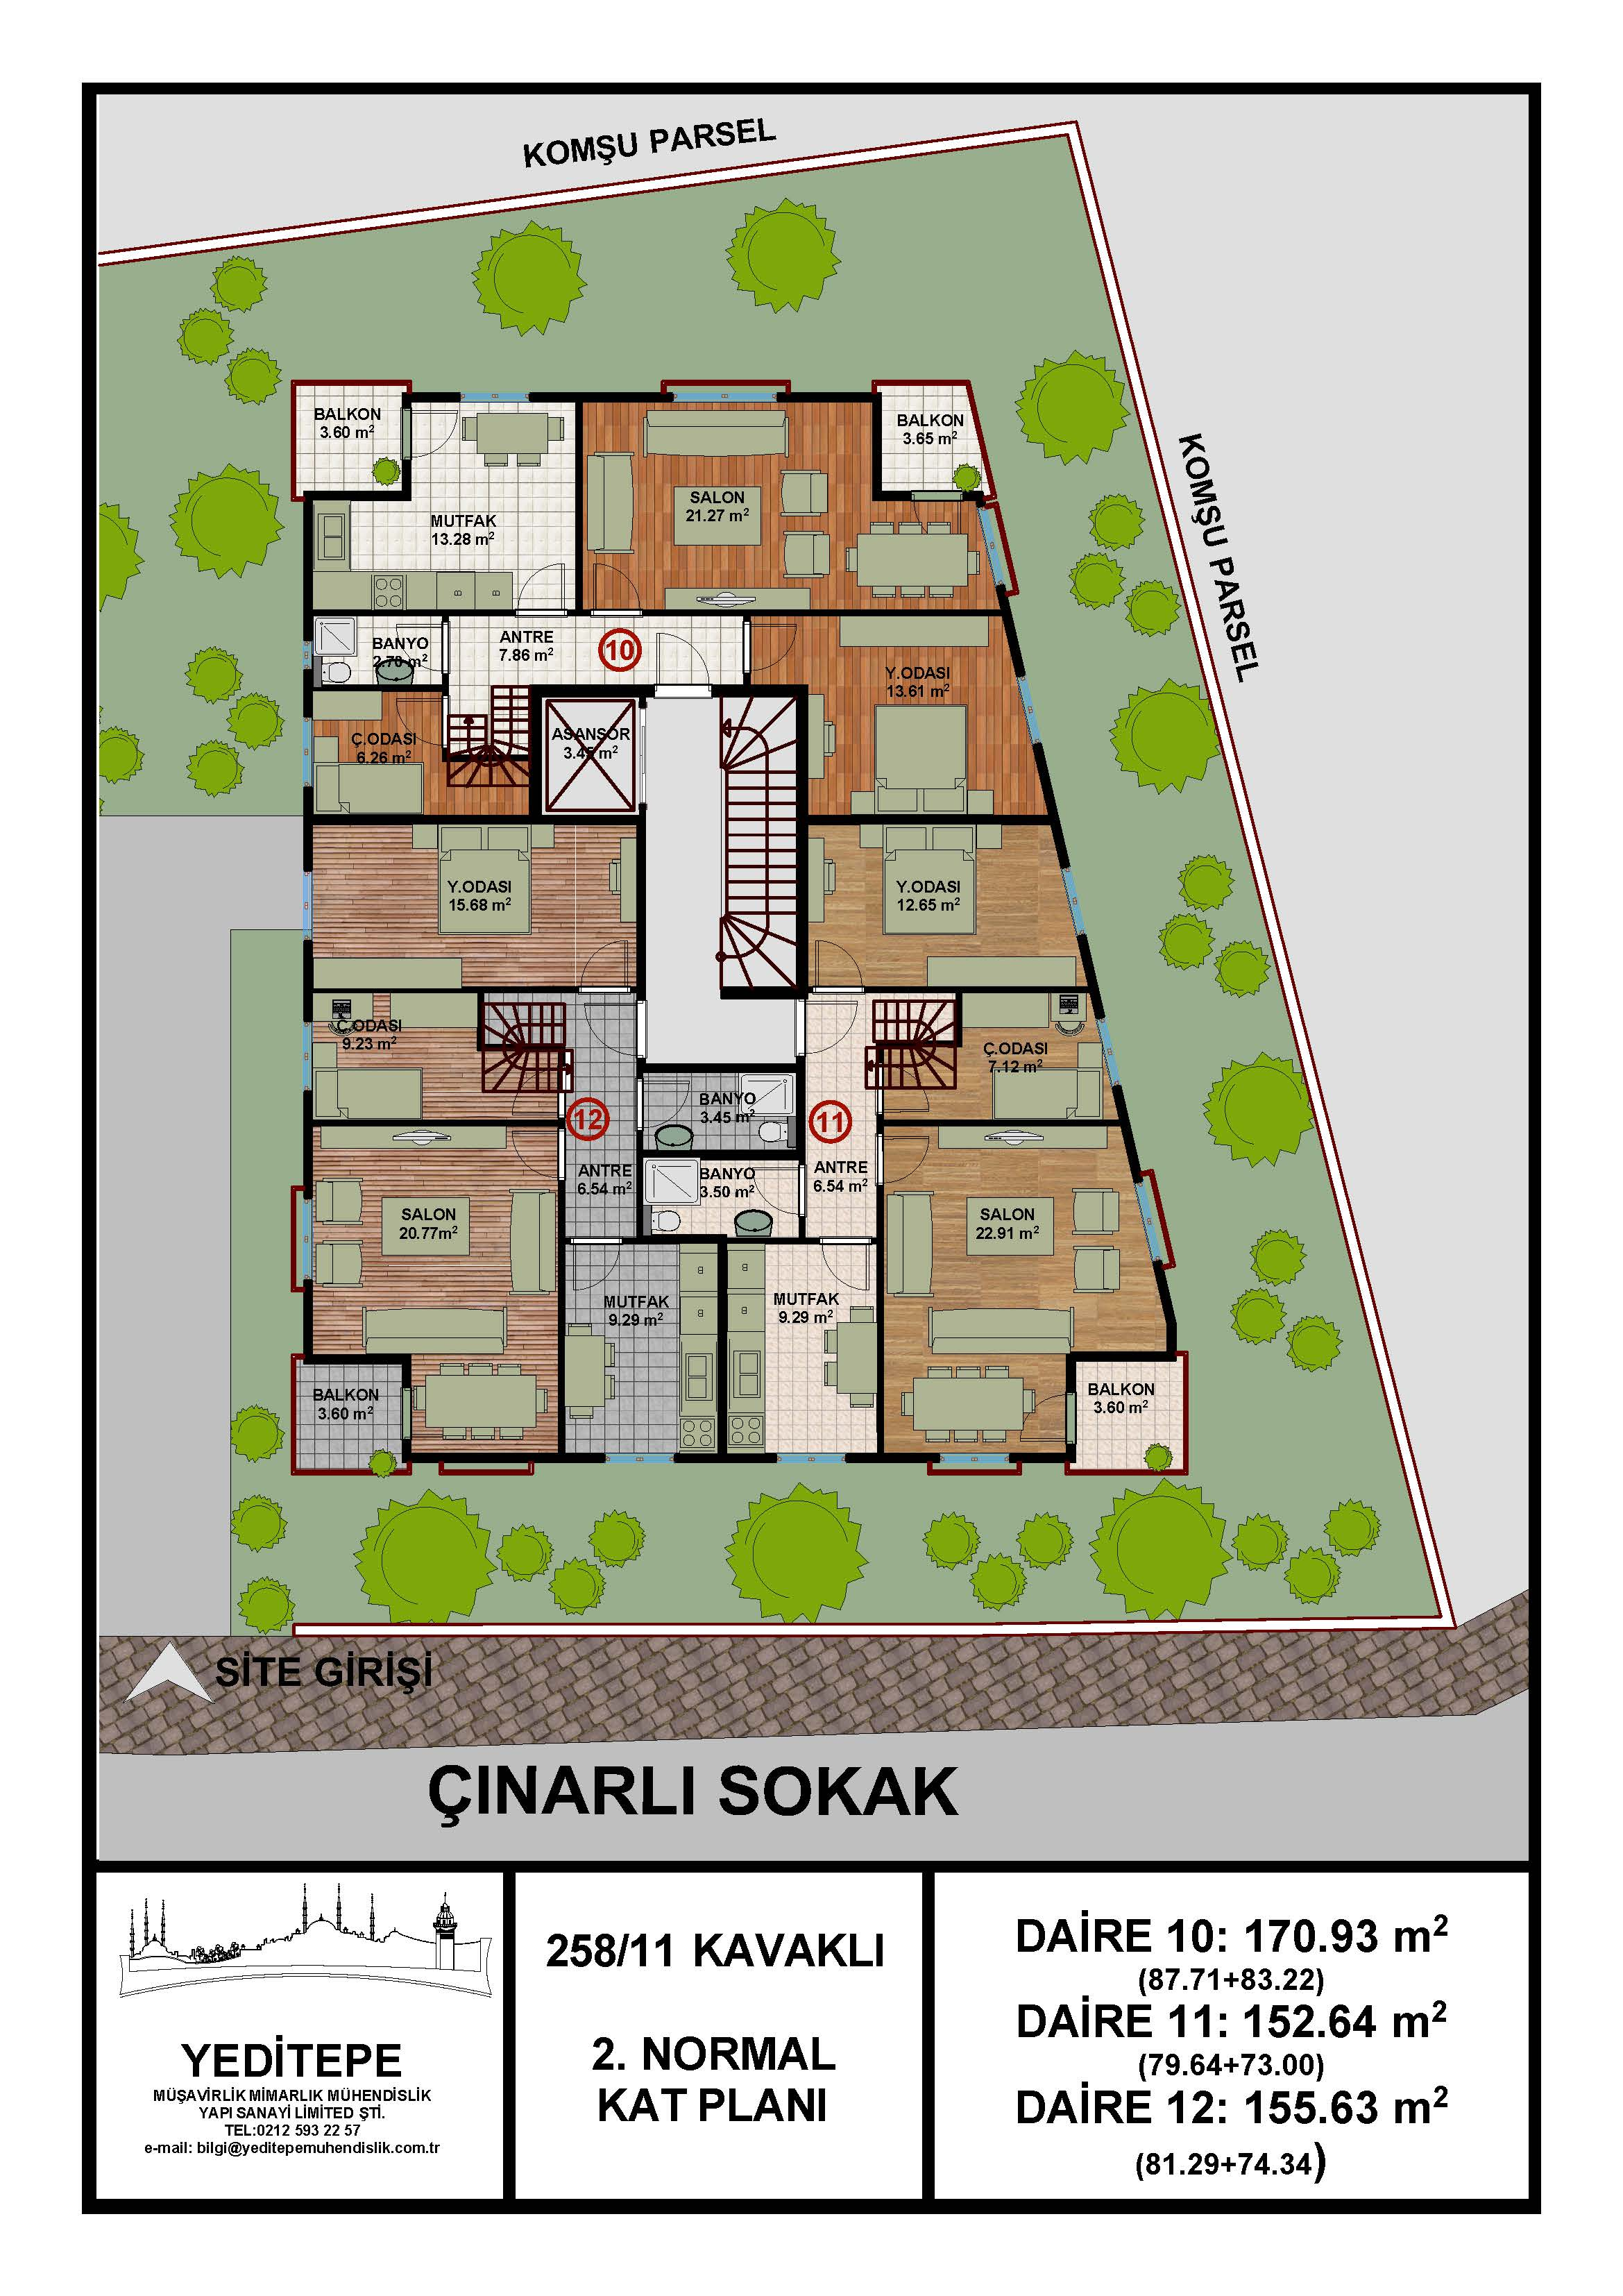 Sinan KORKMAZ 2.Normal Kat